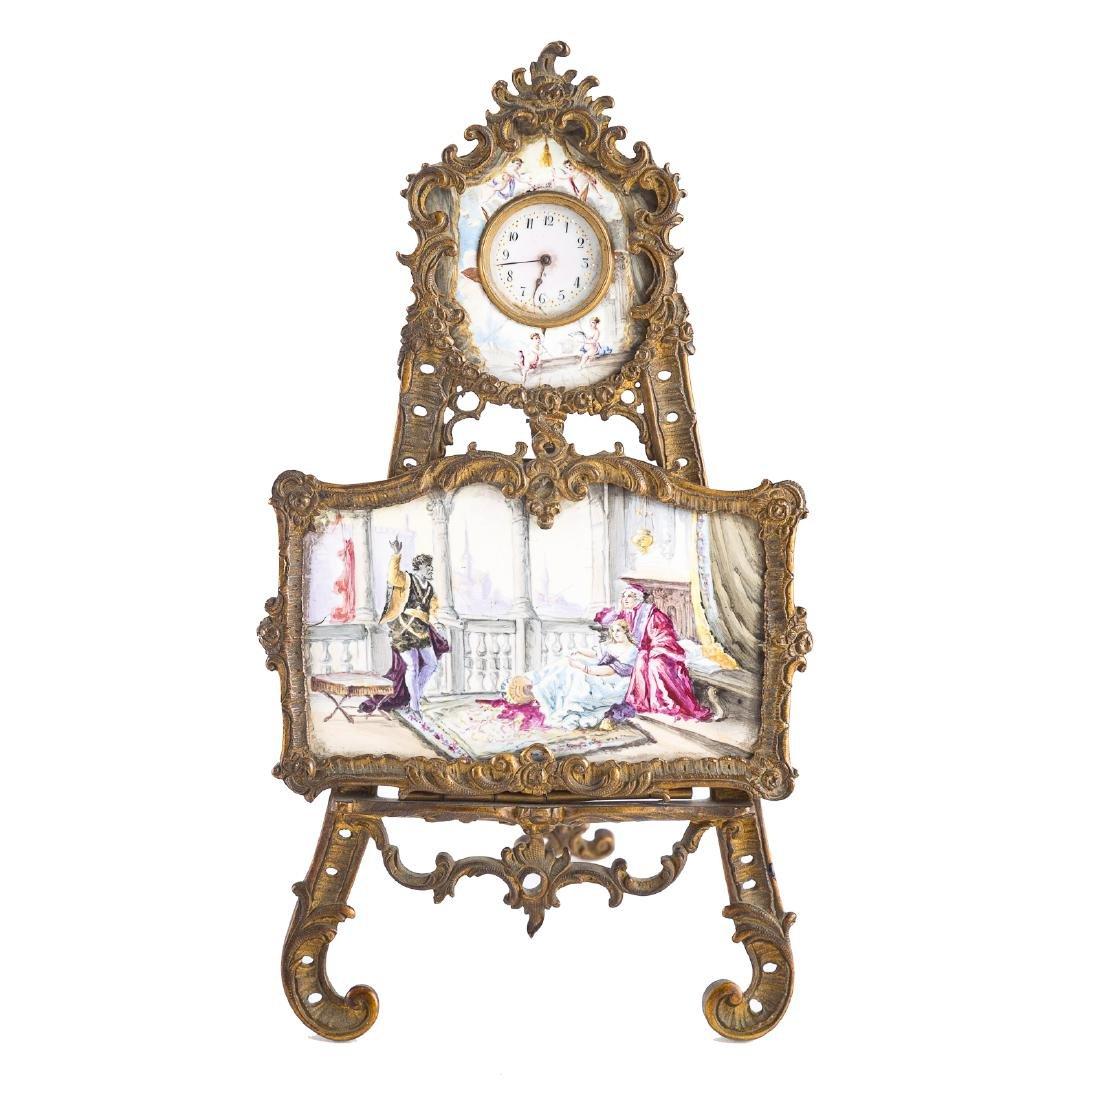 Rococo style gilt-metal desk clock